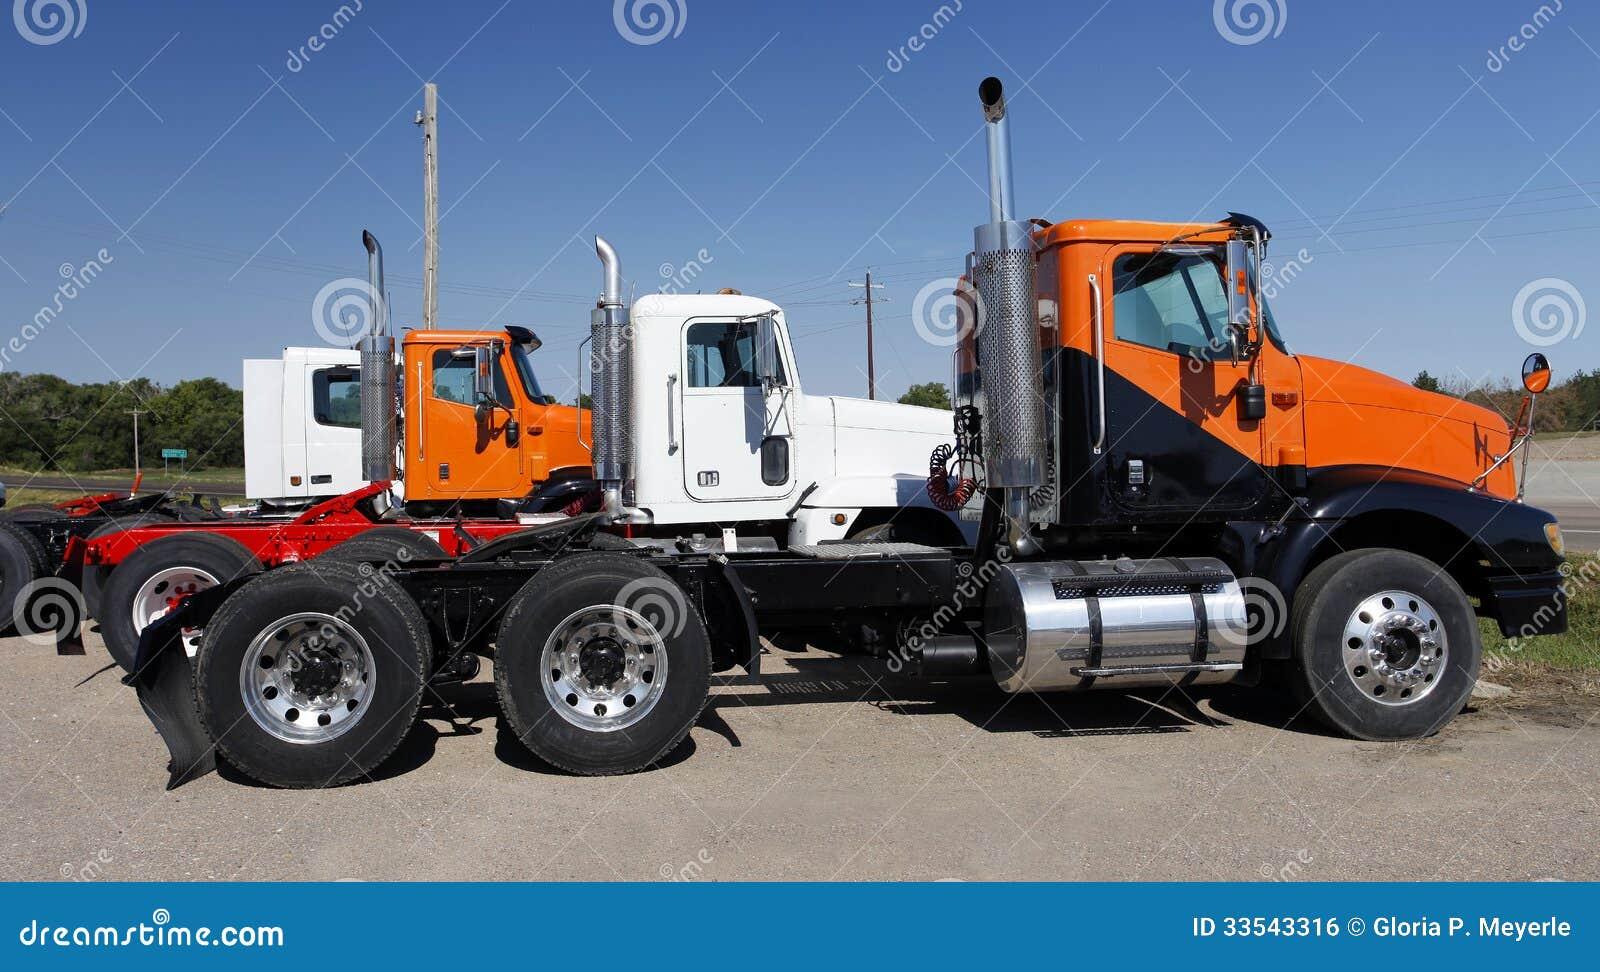 Semi Truck Seats >> Semi Trucks In Orange And White Stock Photo - Image: 33543316